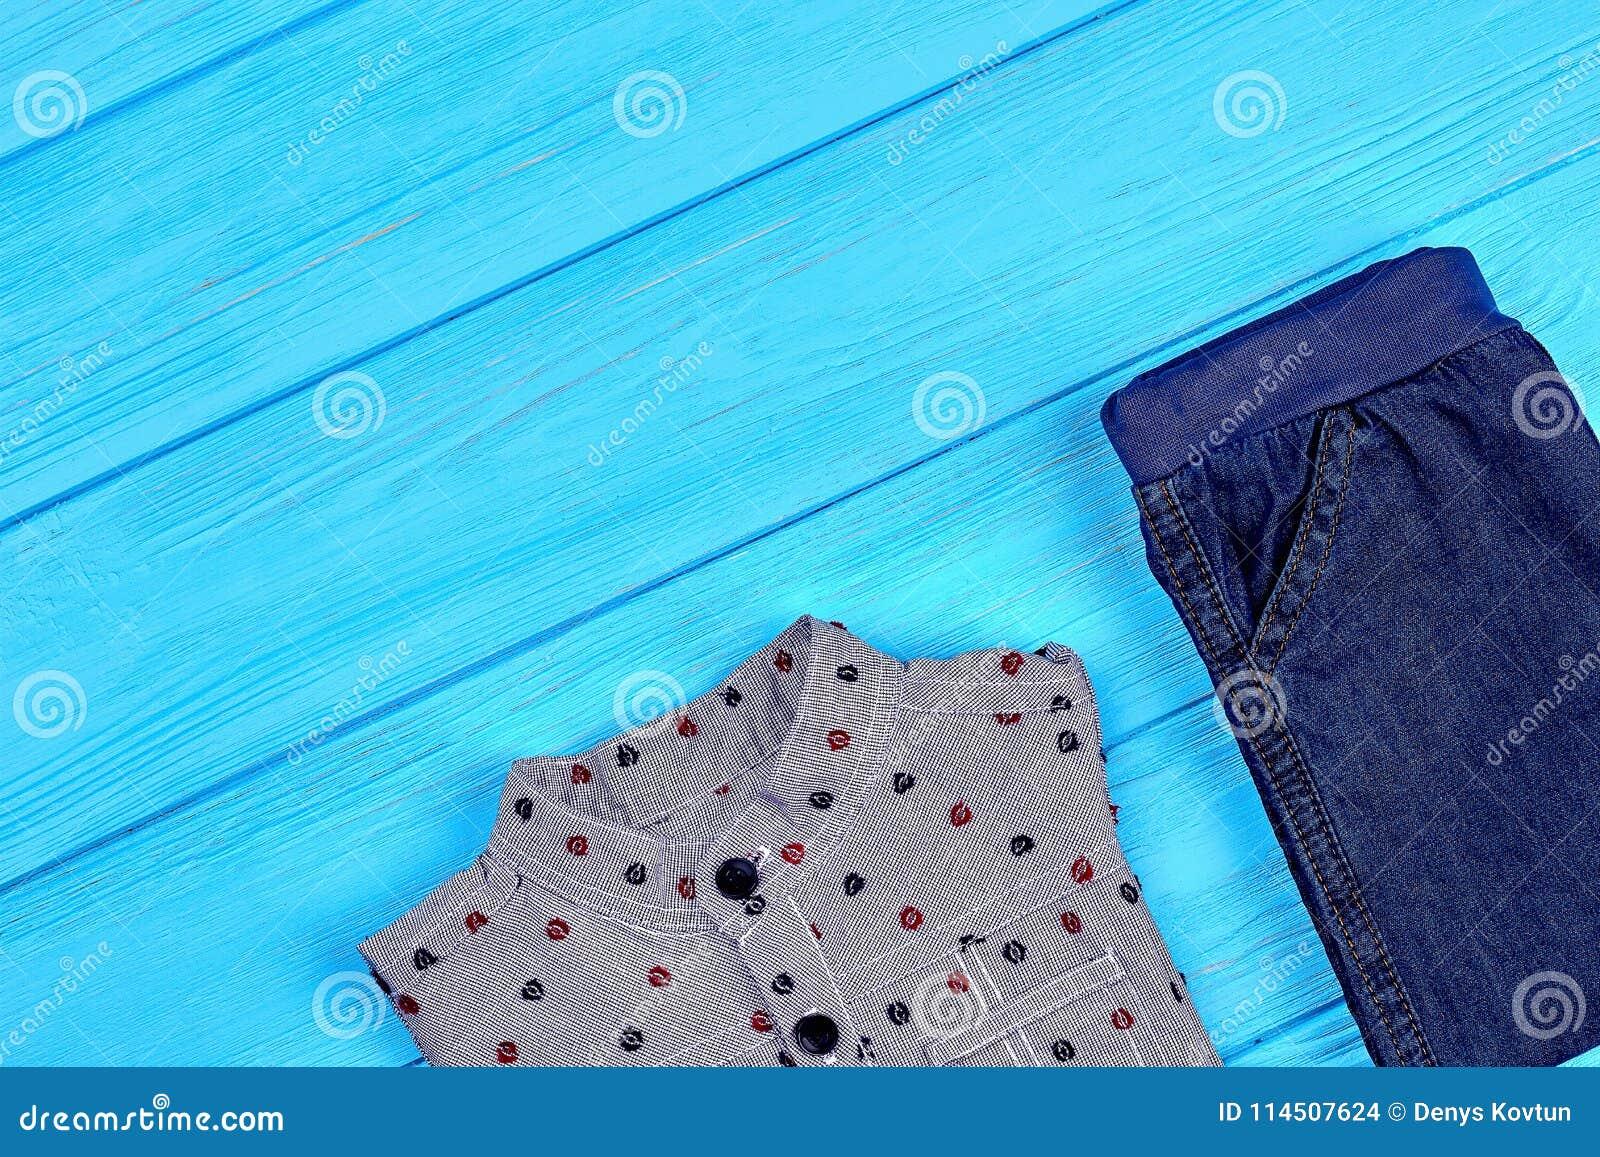 609c5372ef88 Set Of Trendy Garment For Baby-boy. Stock Photo - Image of little ...